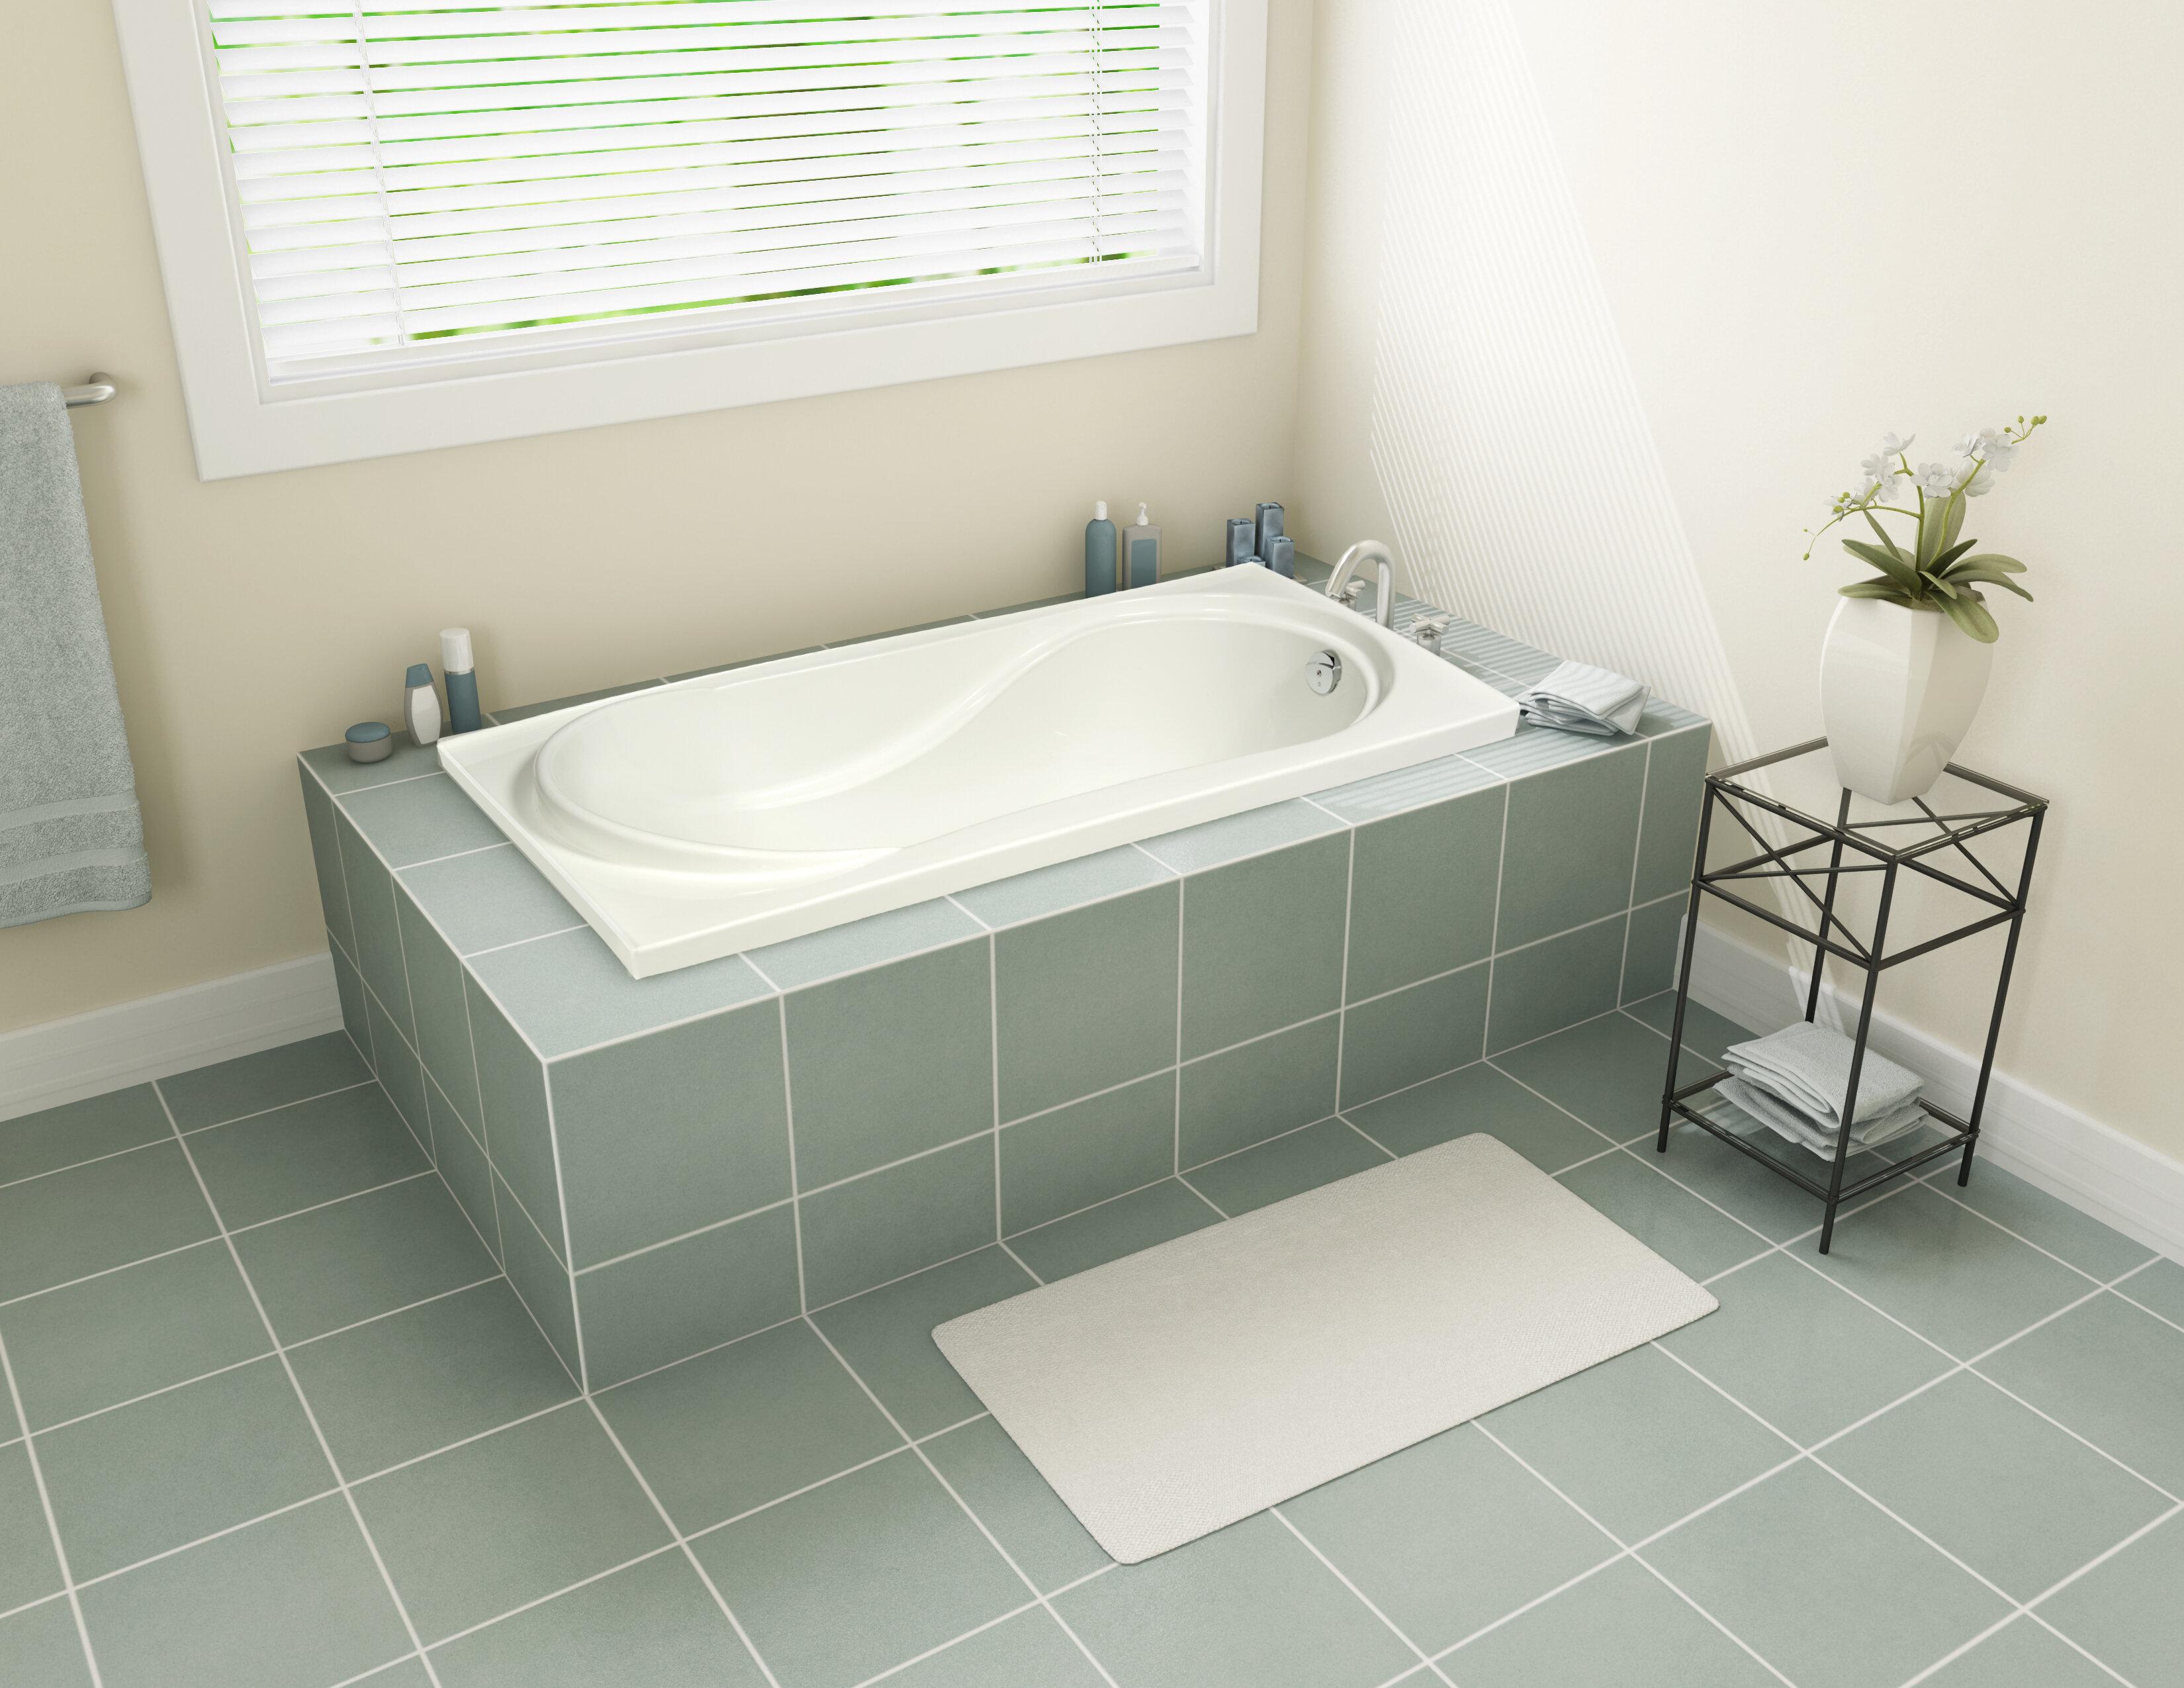 Marimba 31 X 60 Drop In Soaking Bathtub